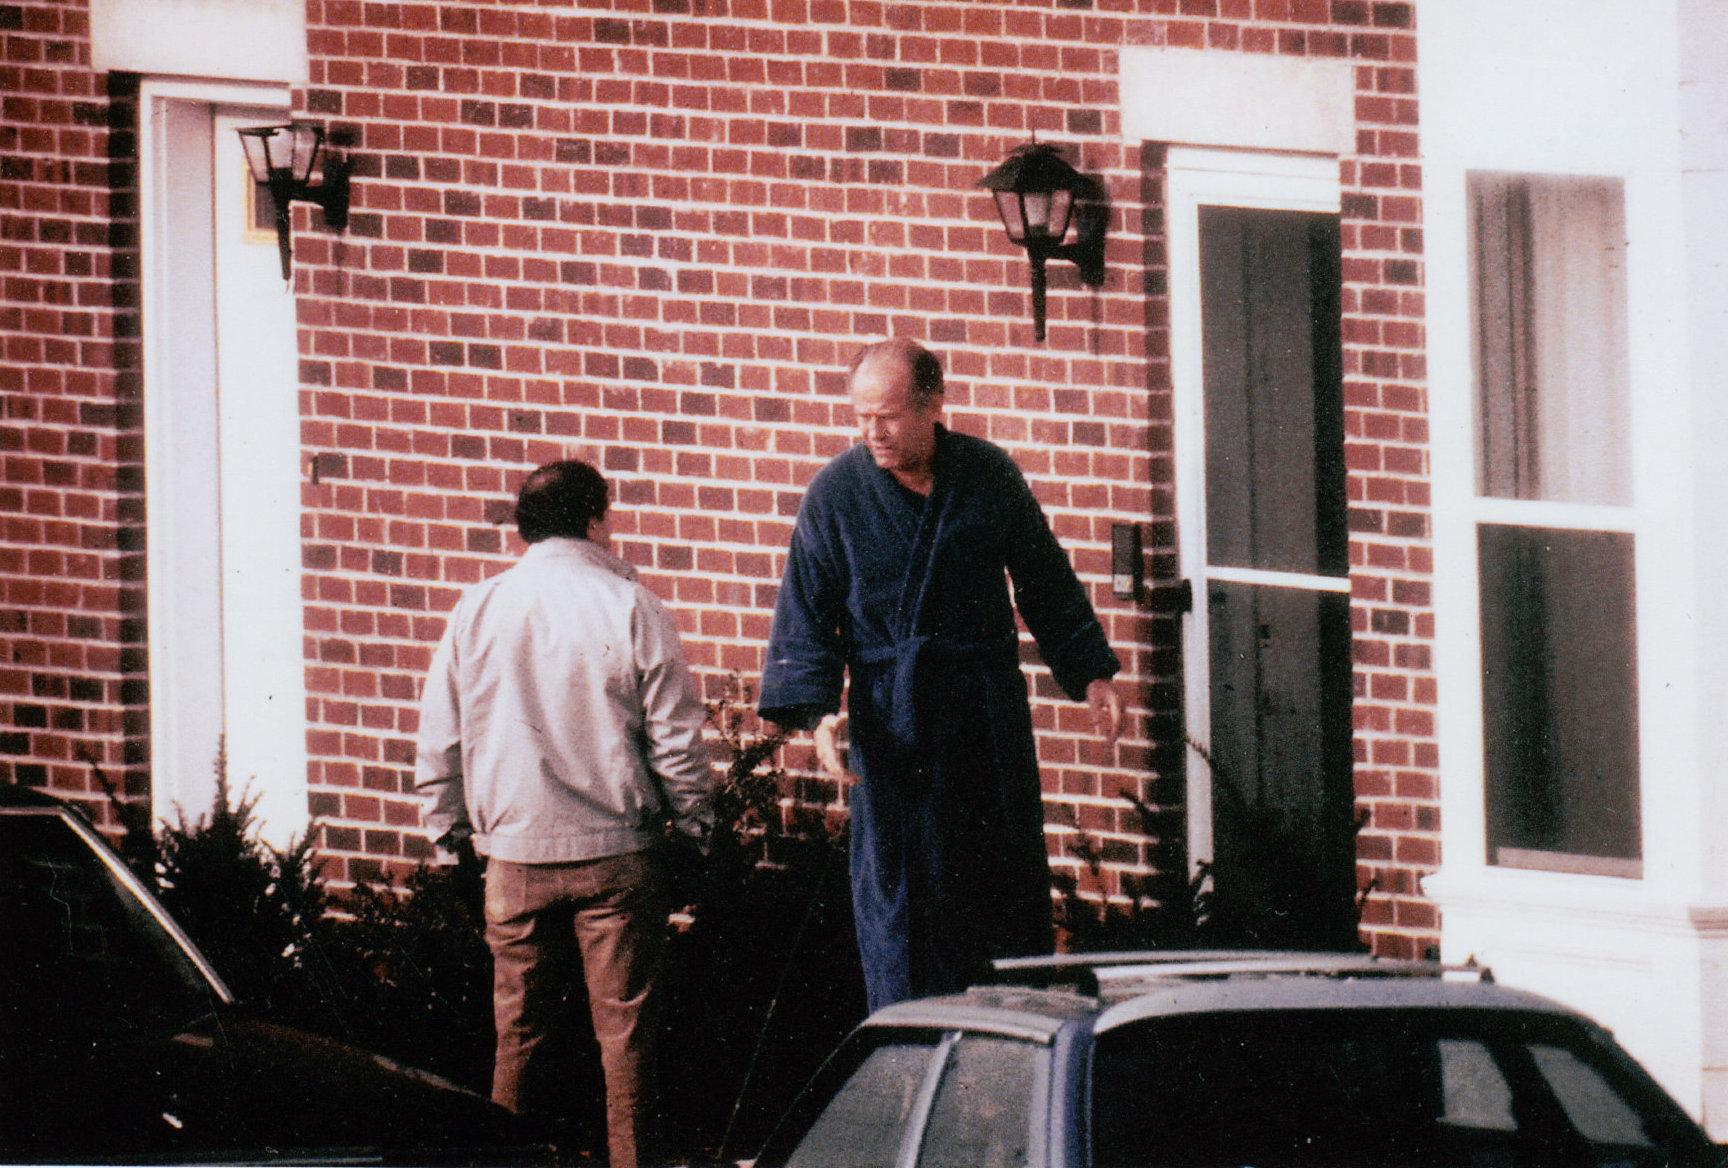 FBI surveillance photograph of Flemmi (left) with Winter Hill Gang boss, James Bulger (right) c. 1980s.